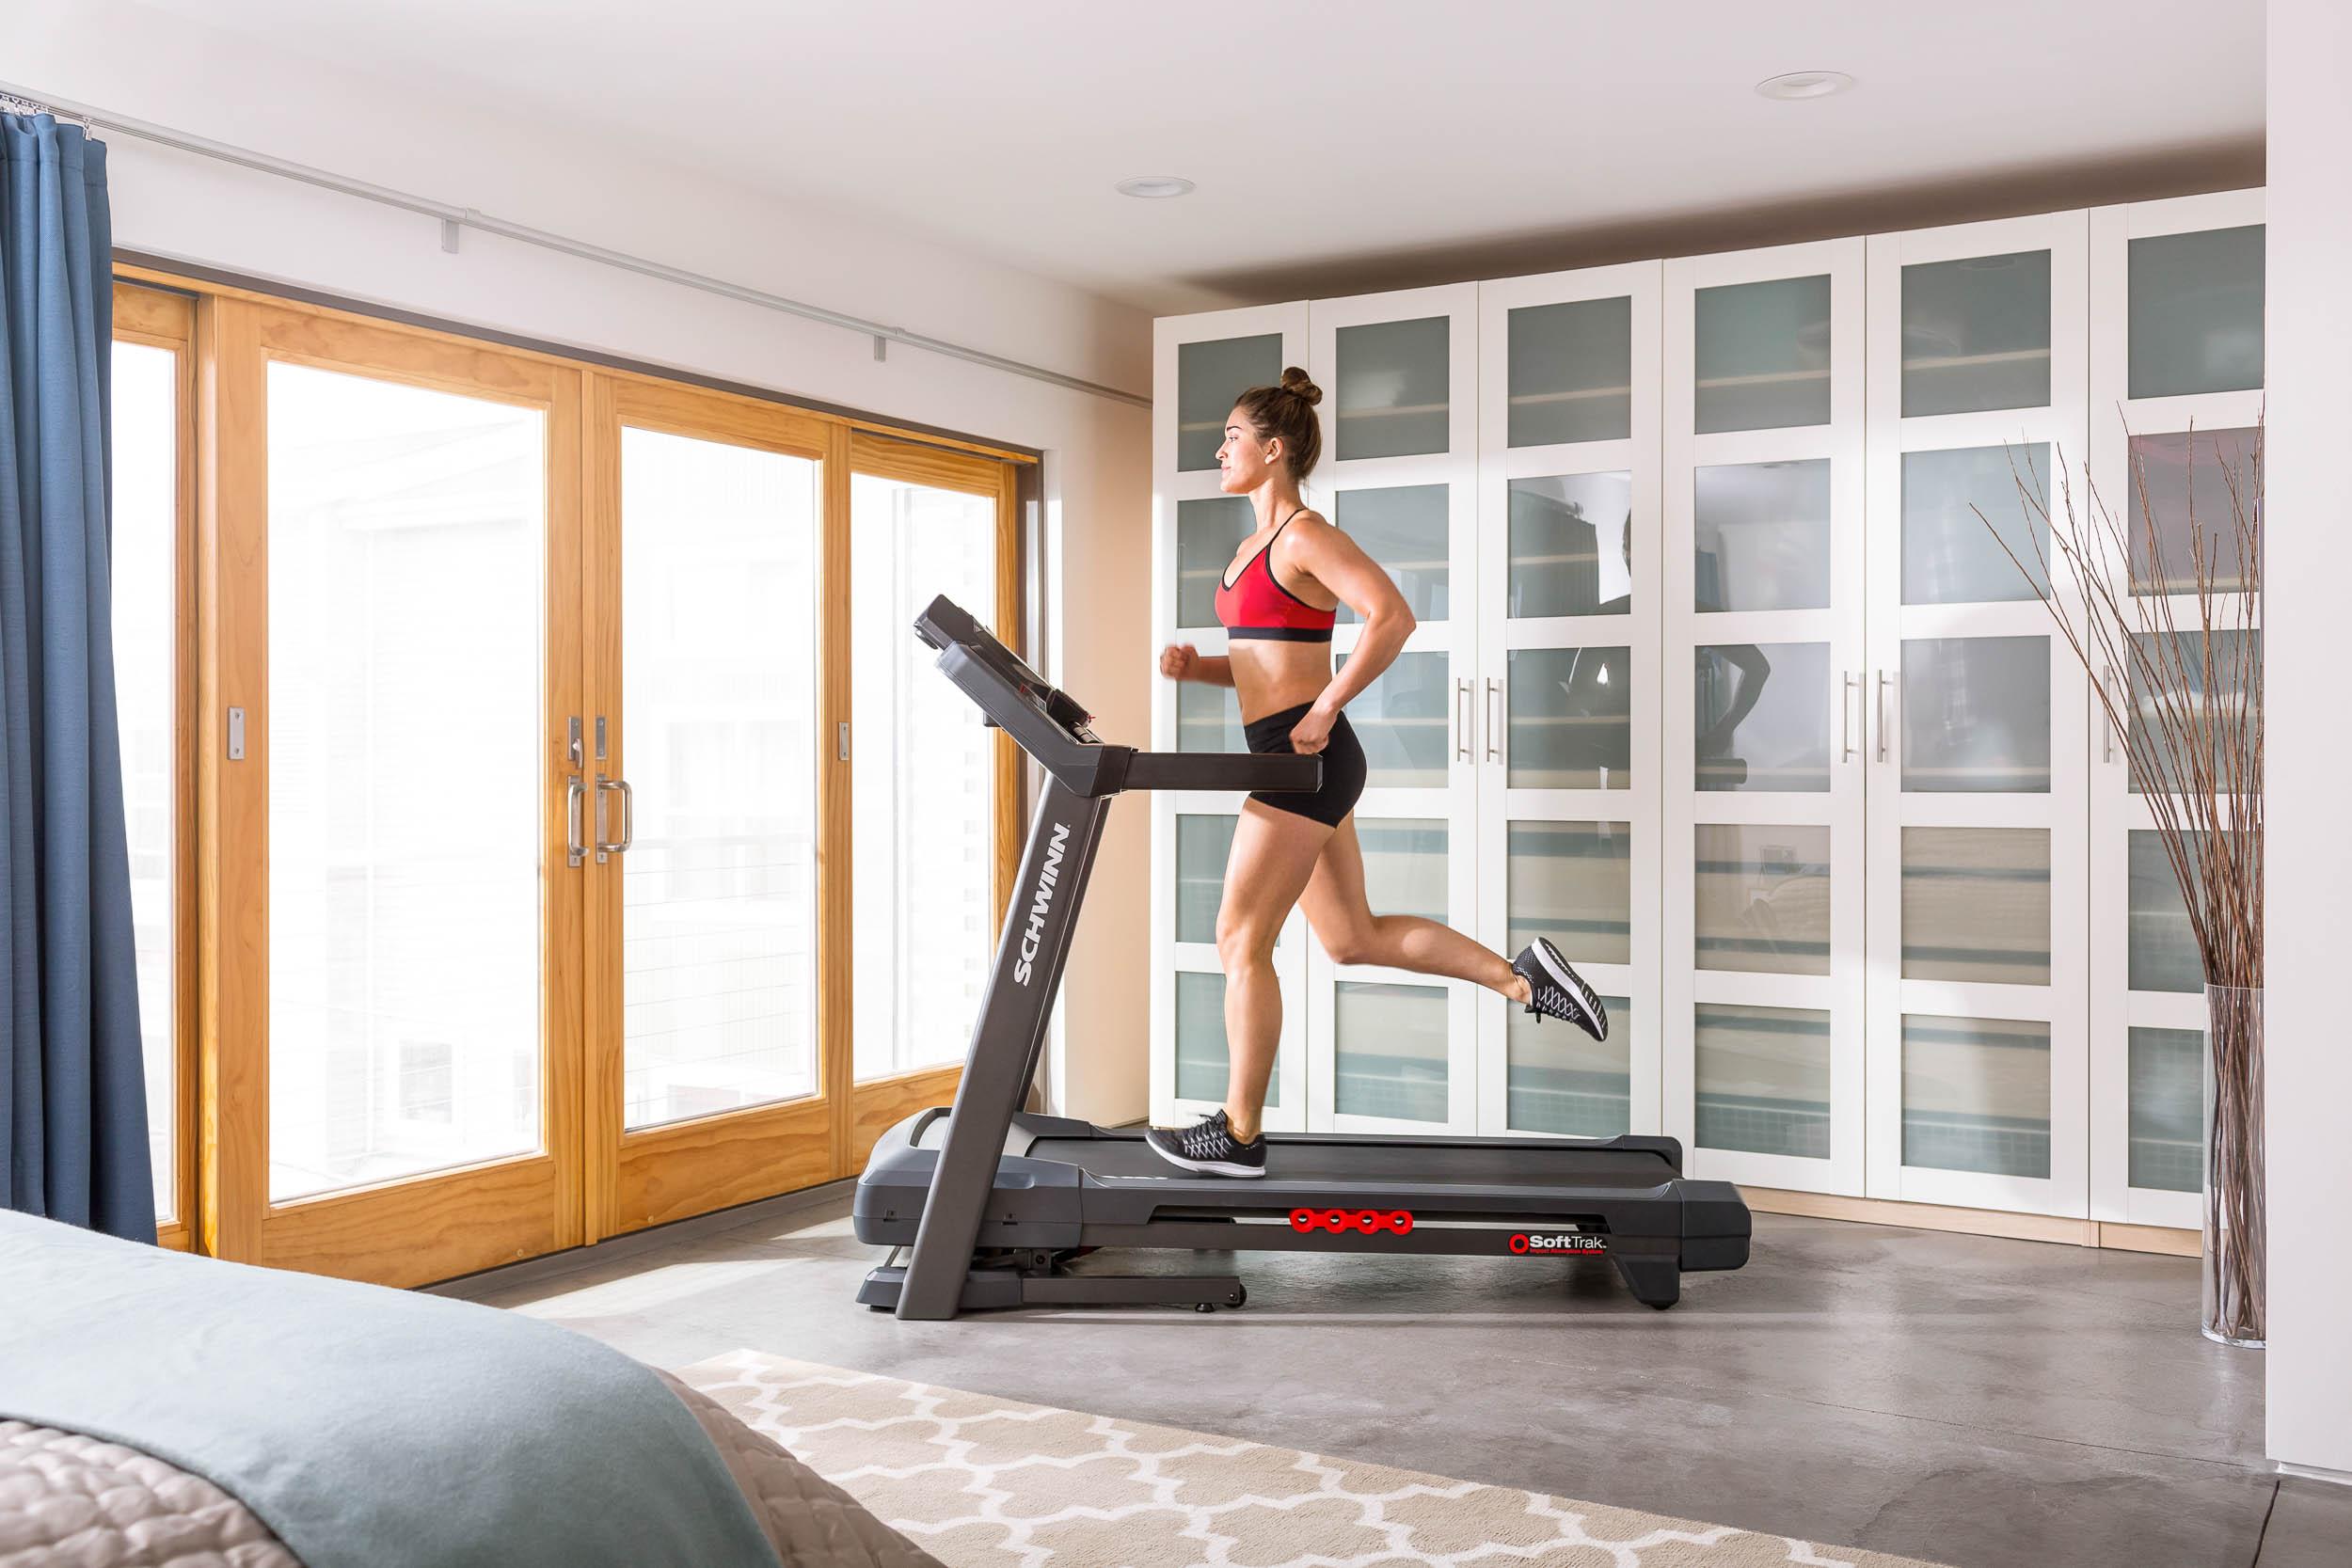 Nautilus_Direct_116099_Schwinn Treadmill T830 Profile Julie-0903 copy.jpg